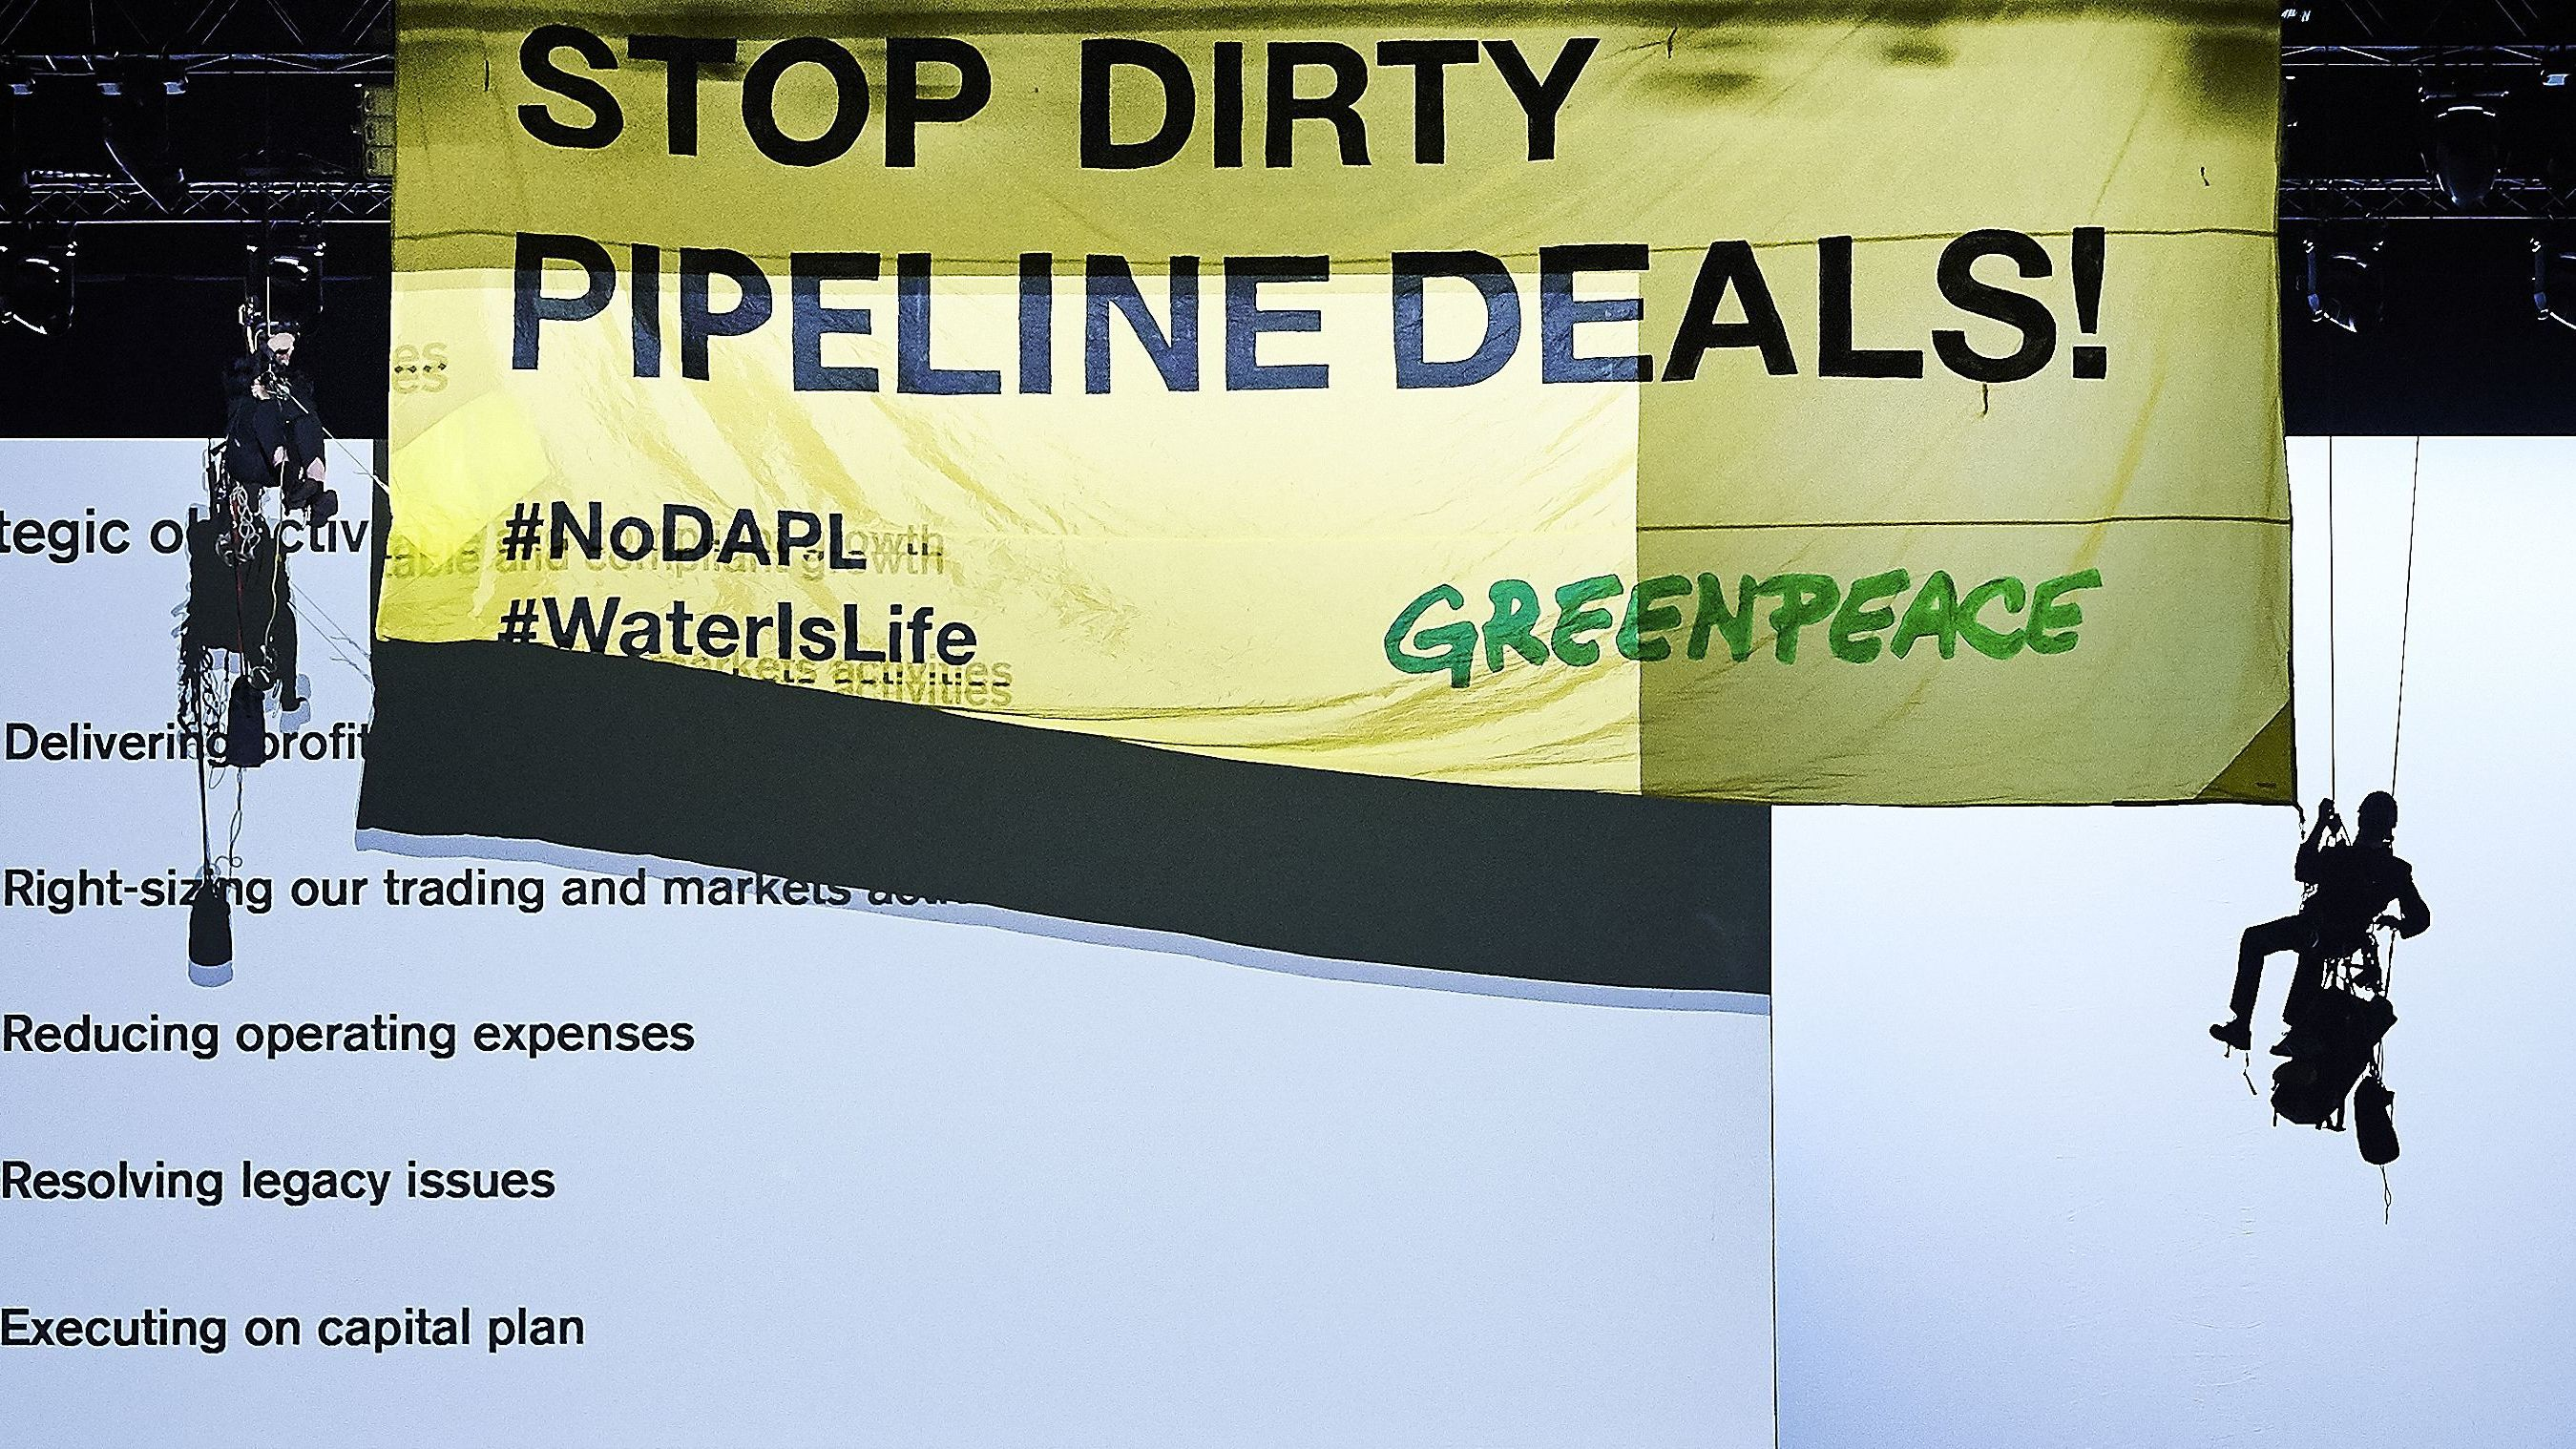 Dakota Access Pipeline Owner Sues Greenpeace For 'Criminal Activity'